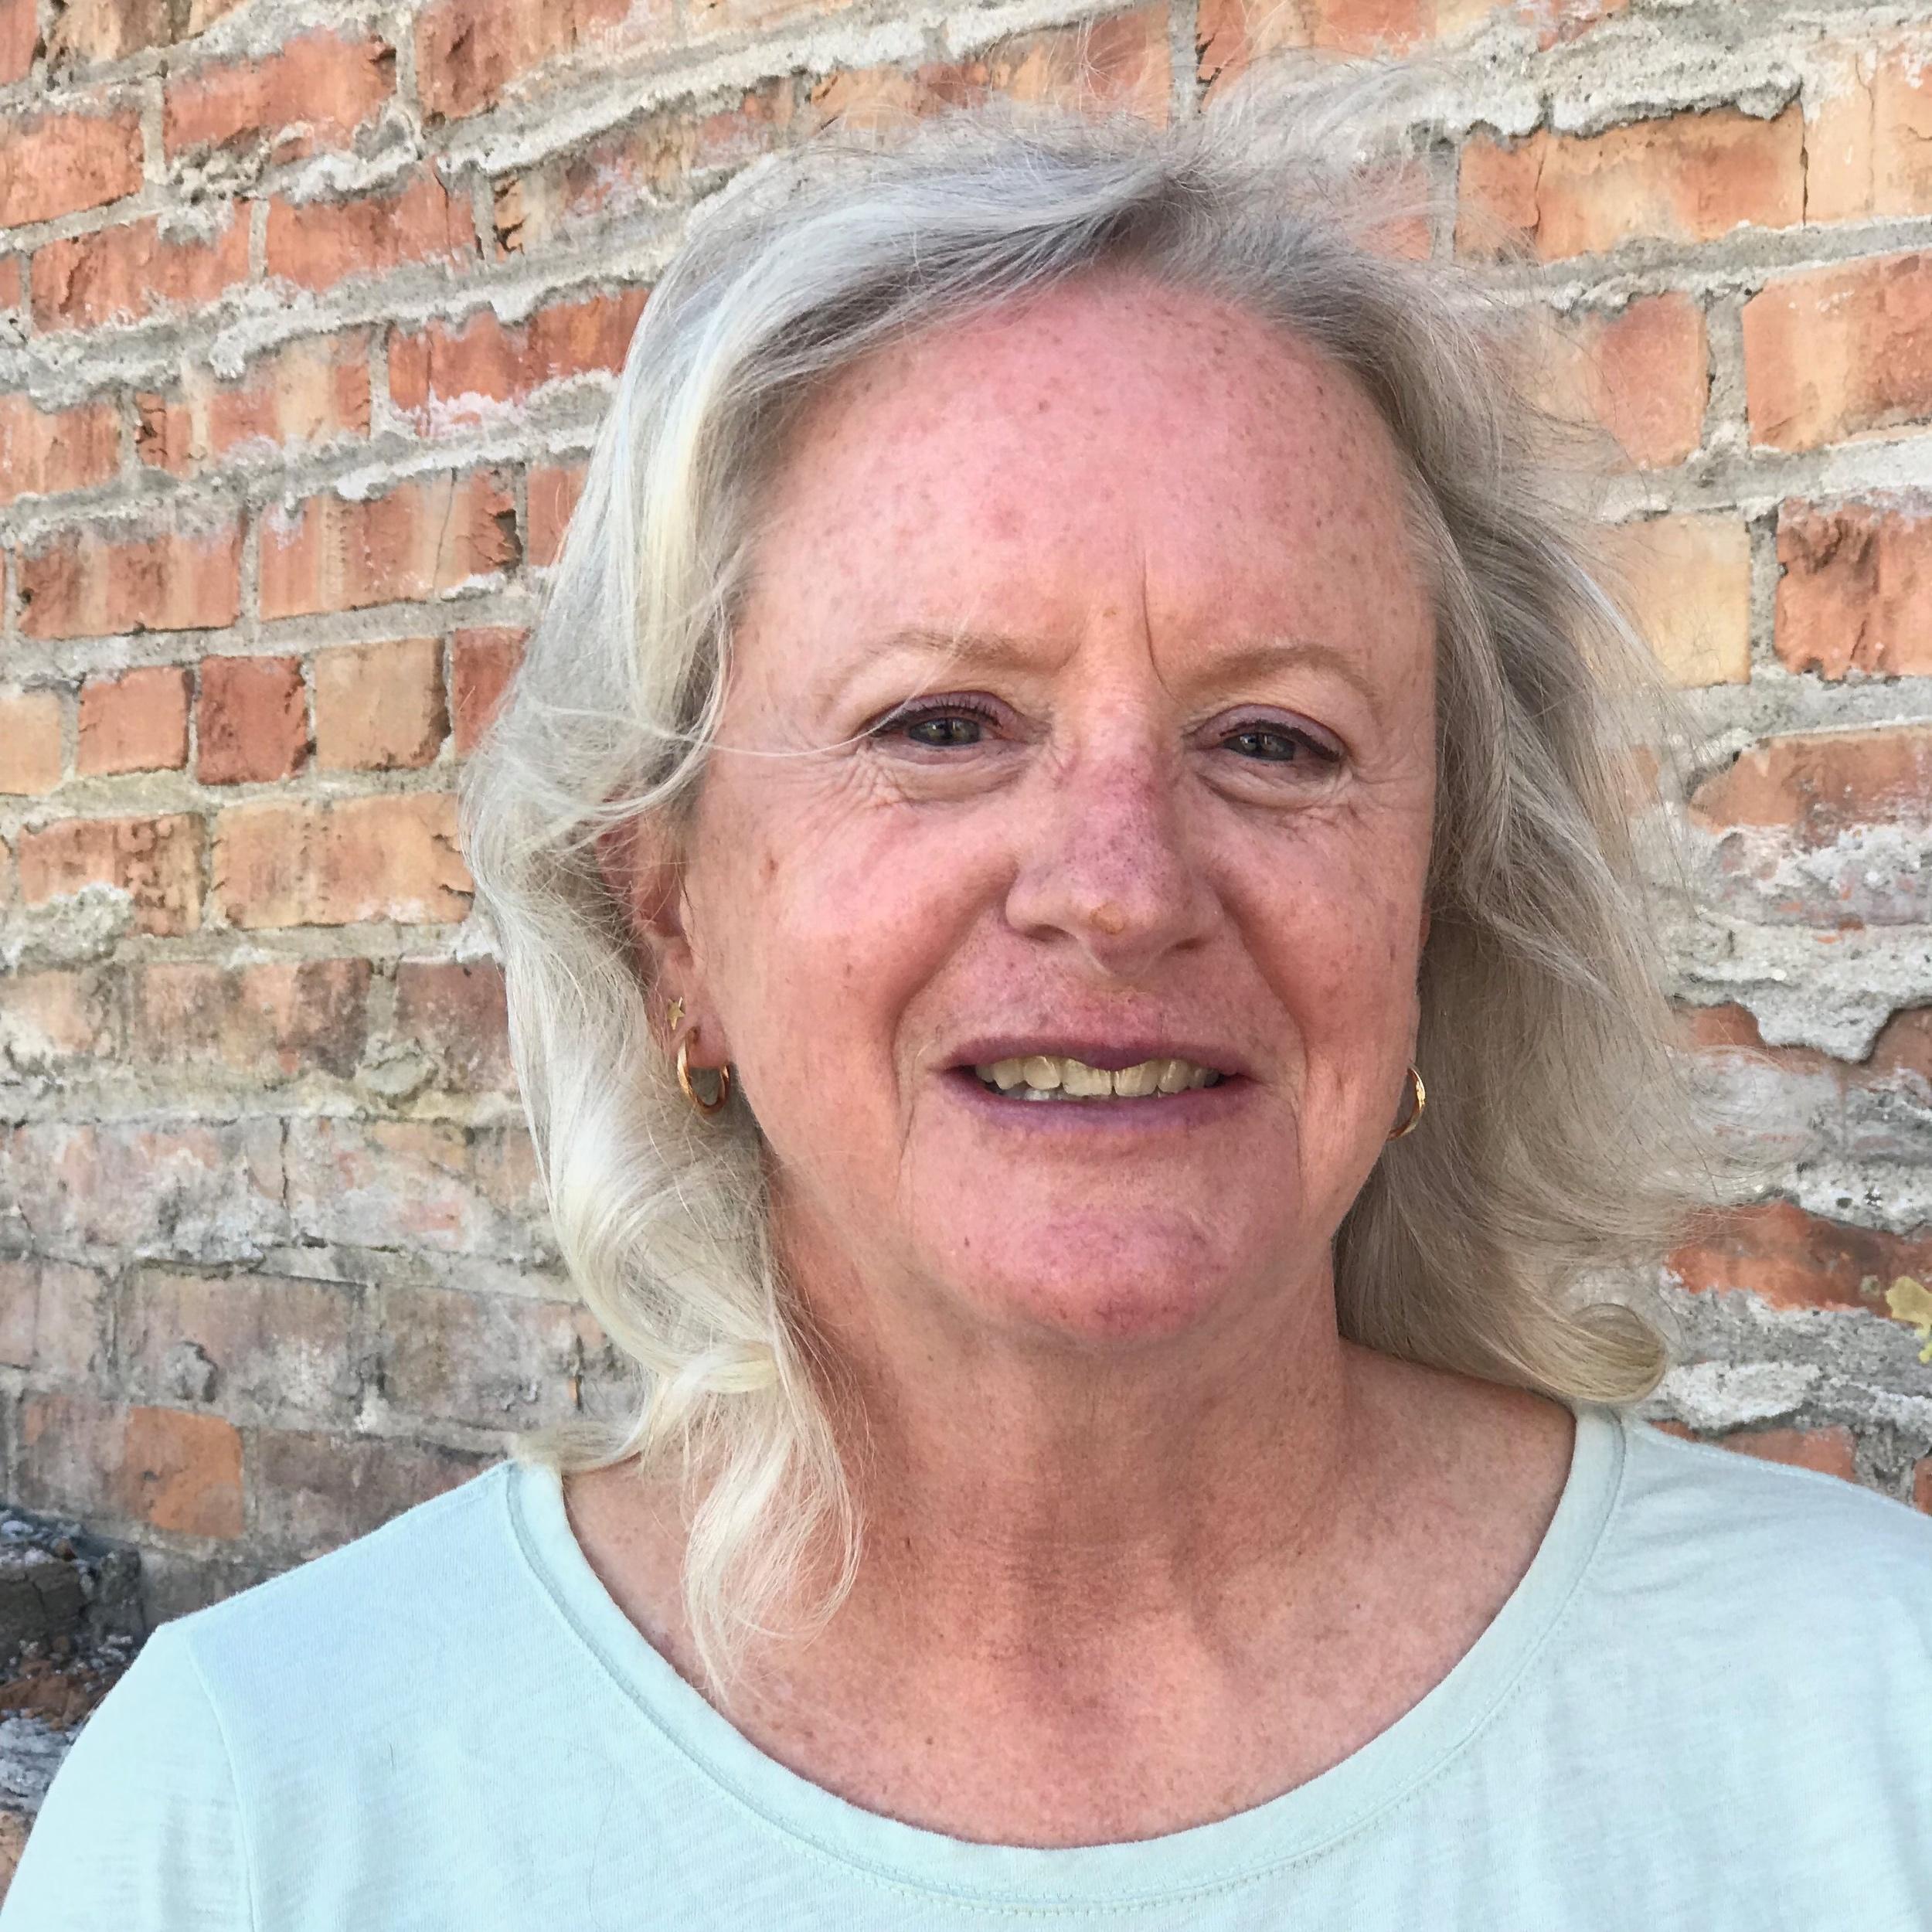 julia Heavirland - Project Manager